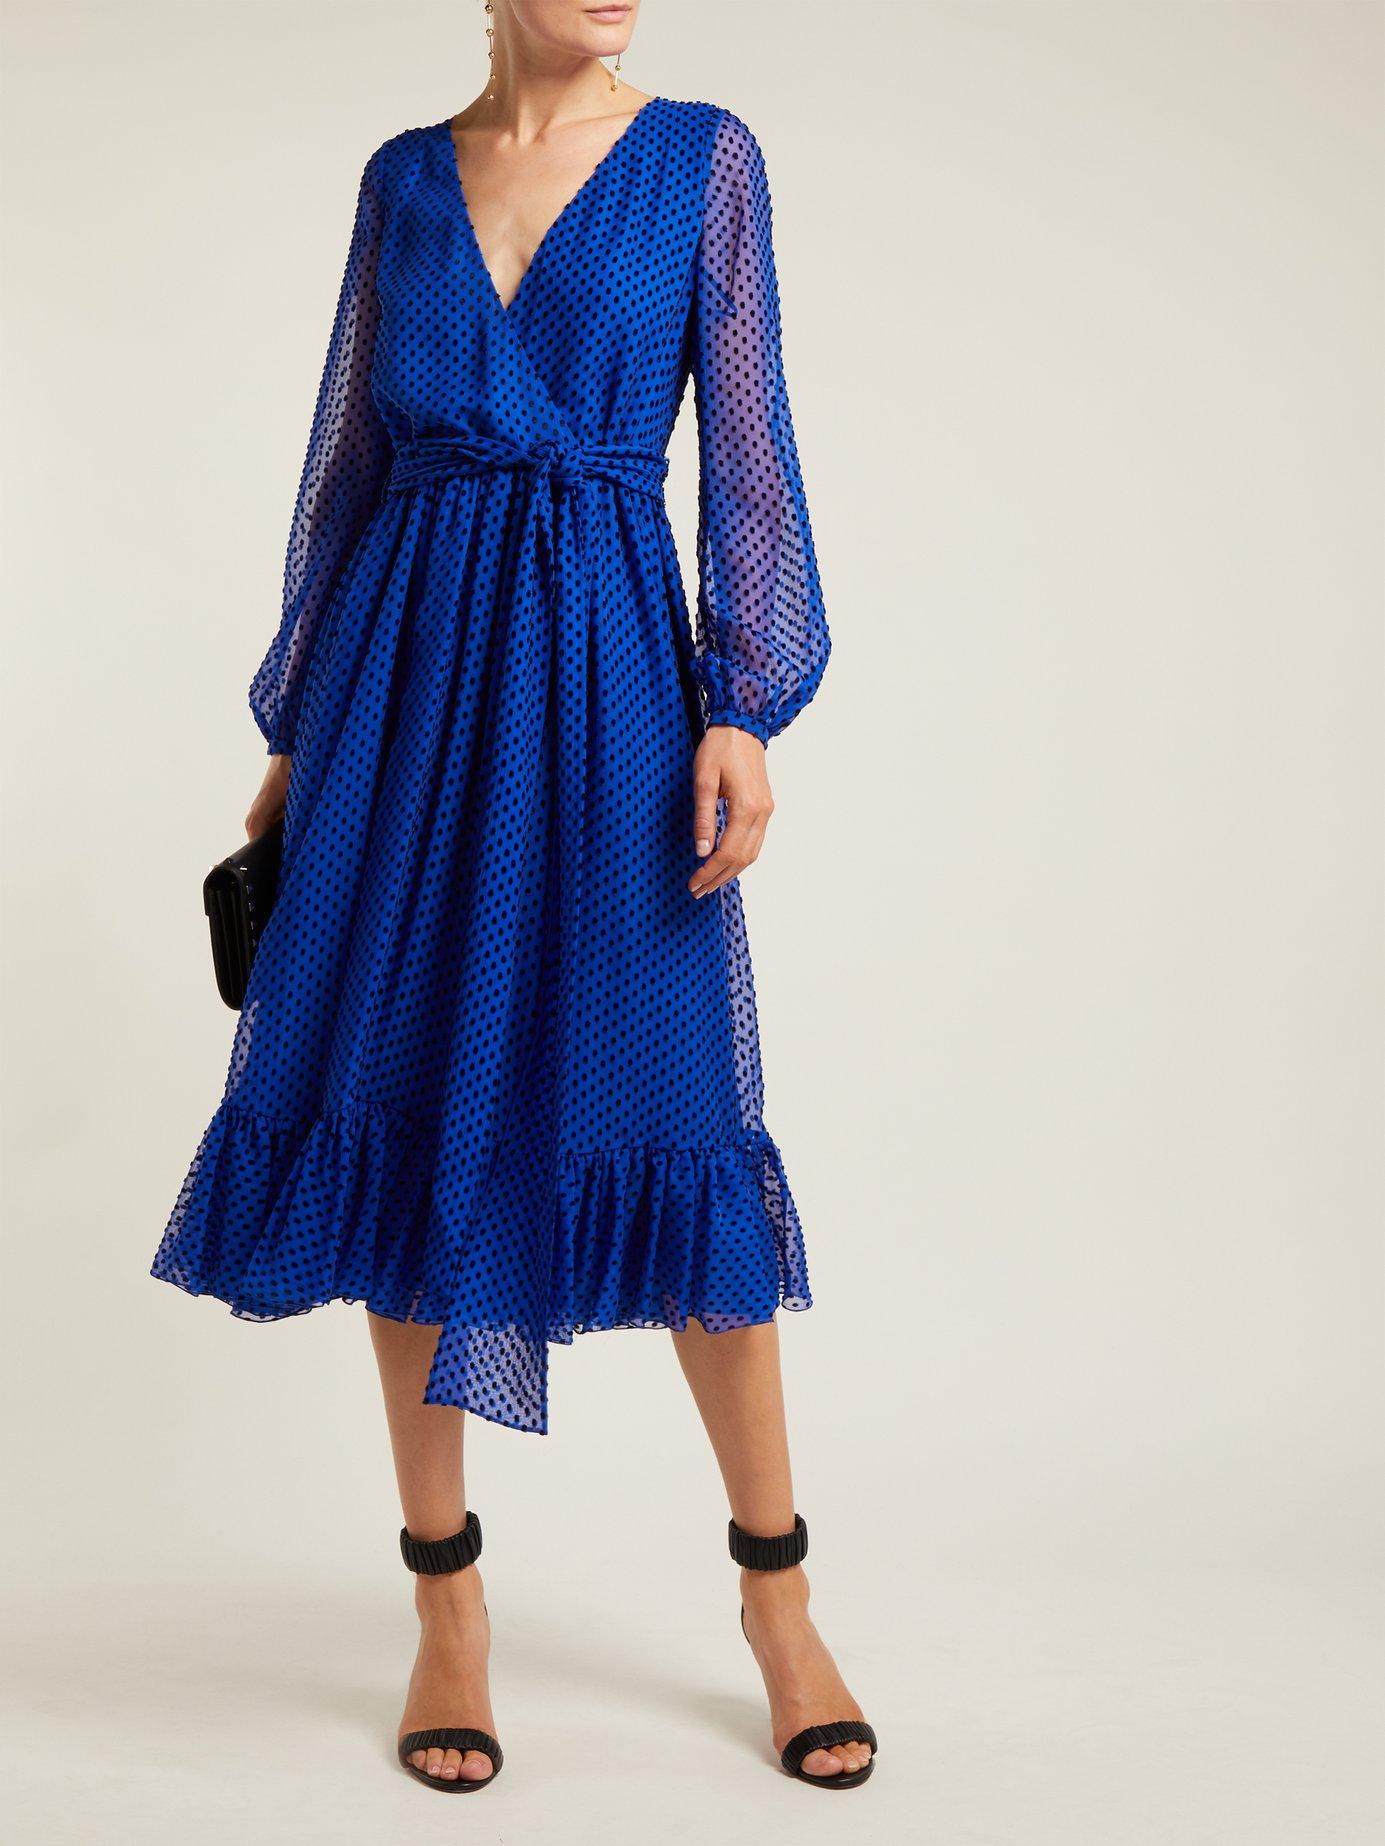 Polka-dot silk-blend dress by Valentino